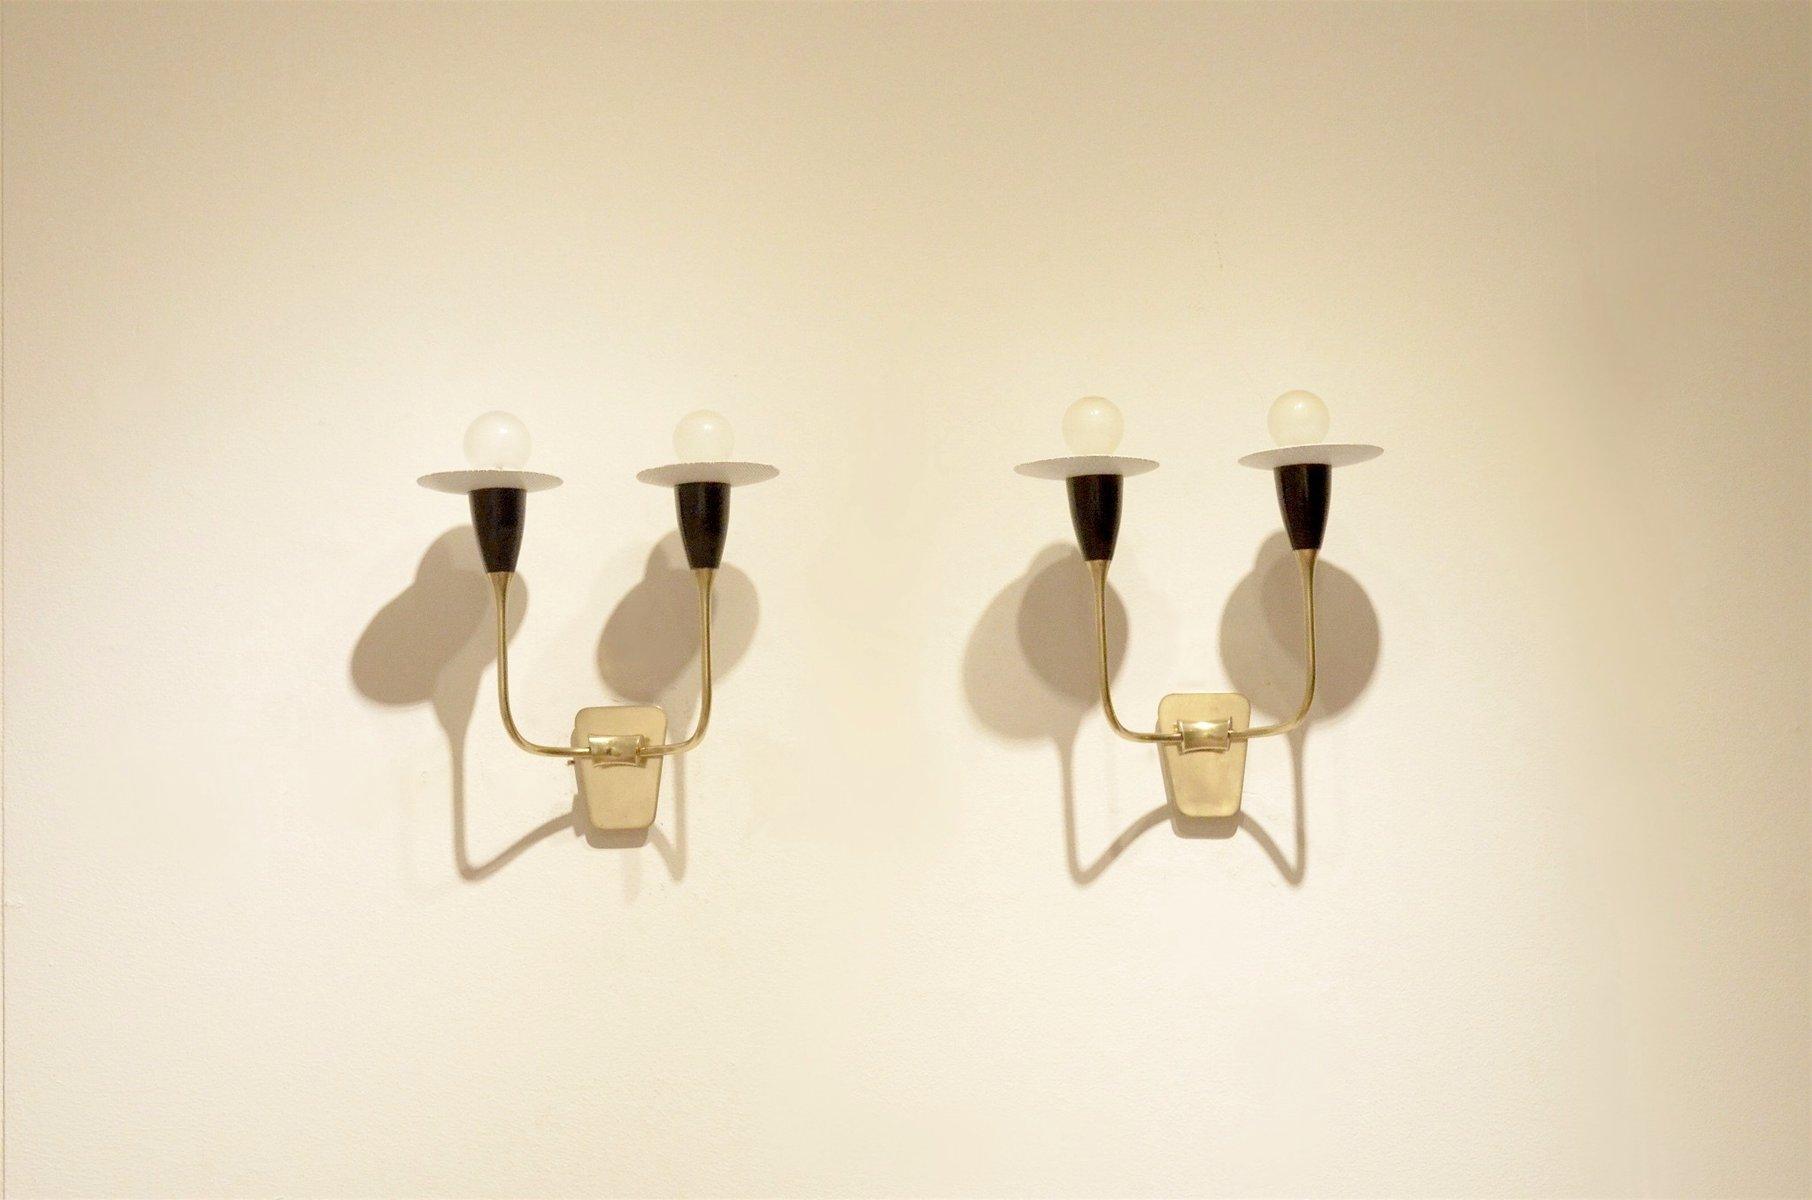 Genial Mid Century Italian Minimalist Black U0026 White Perforated Metal Wall Sconces,  Set Of 2